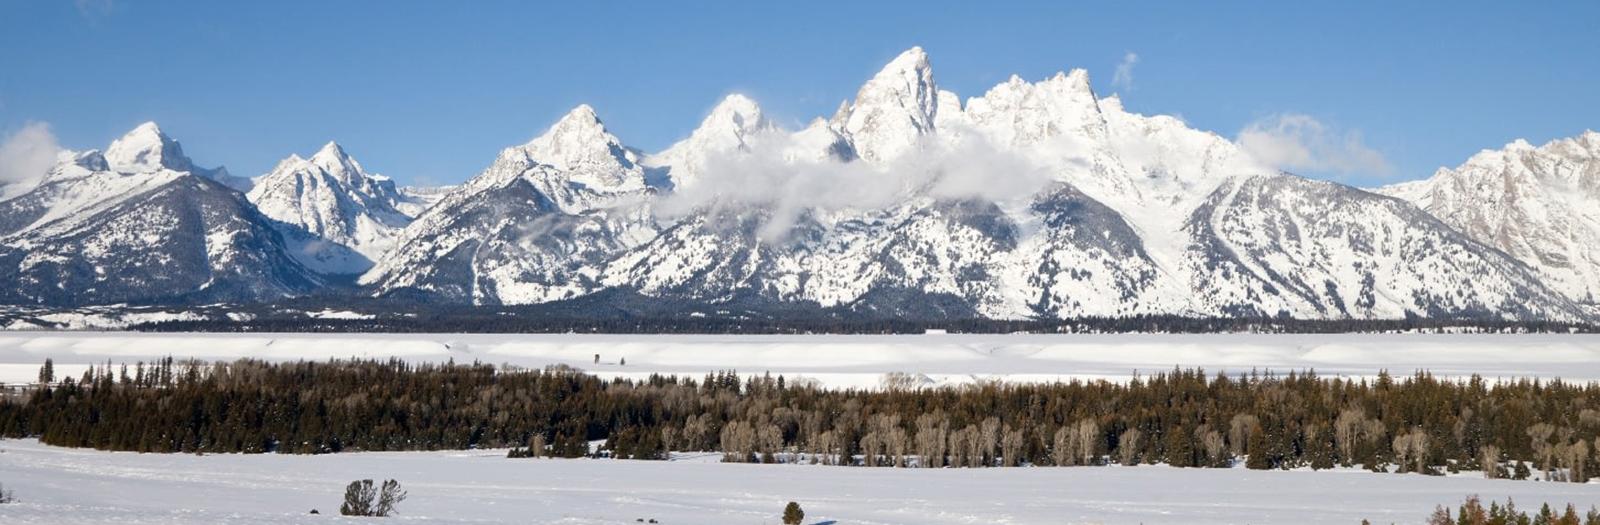 Ski.com 2020-21 Vacation Guide Brochure